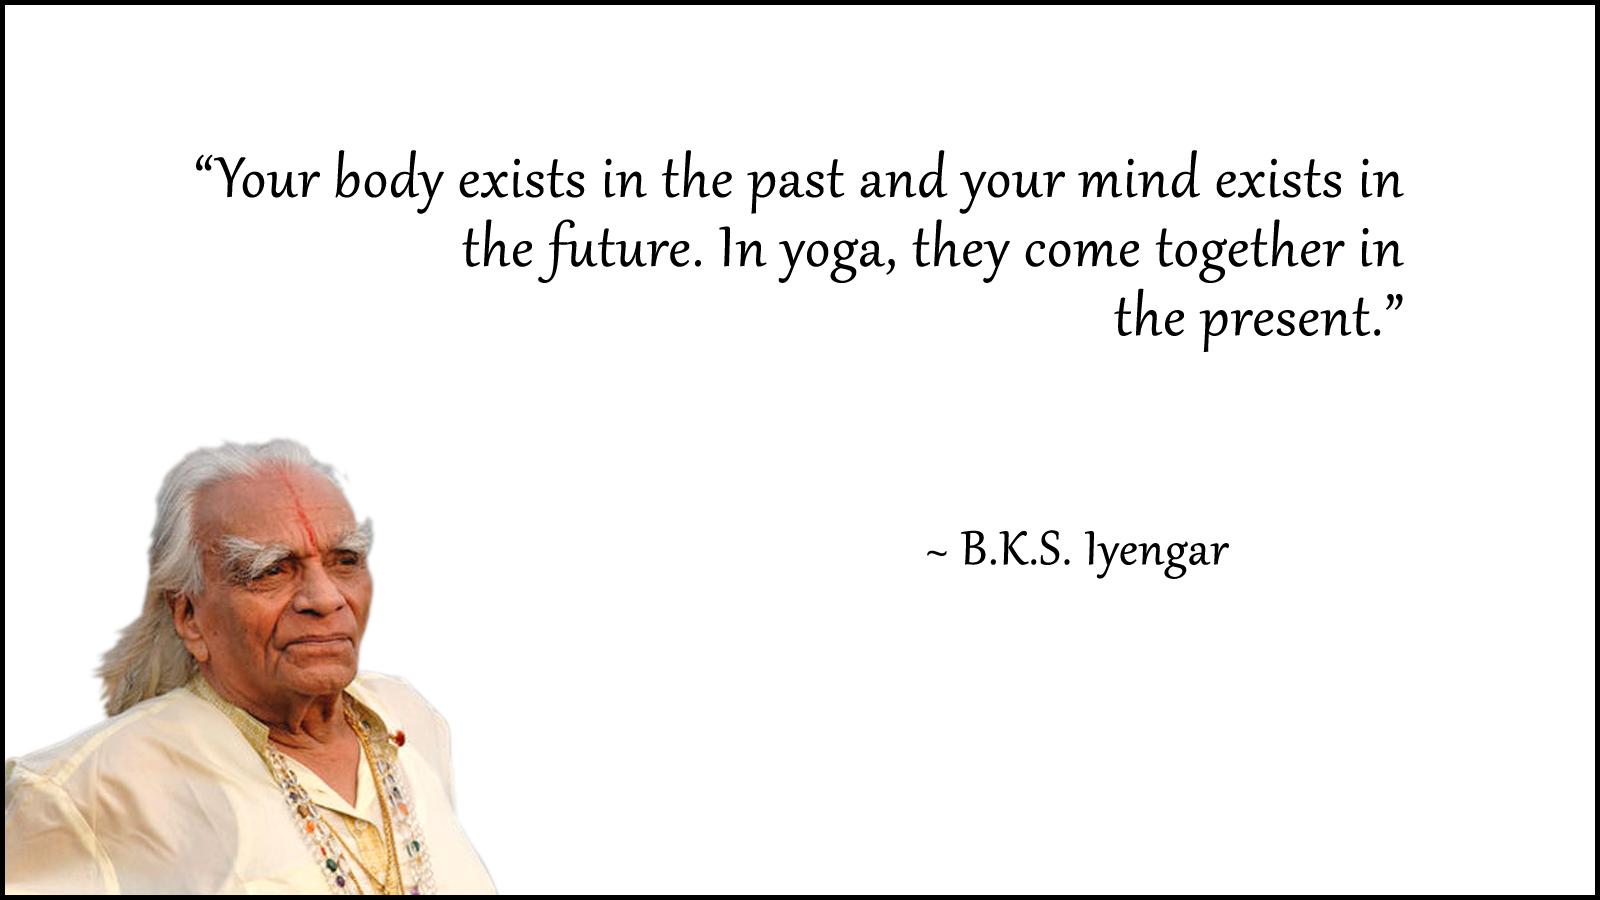 bks-iyengar-quote-yoga-past-future-present1